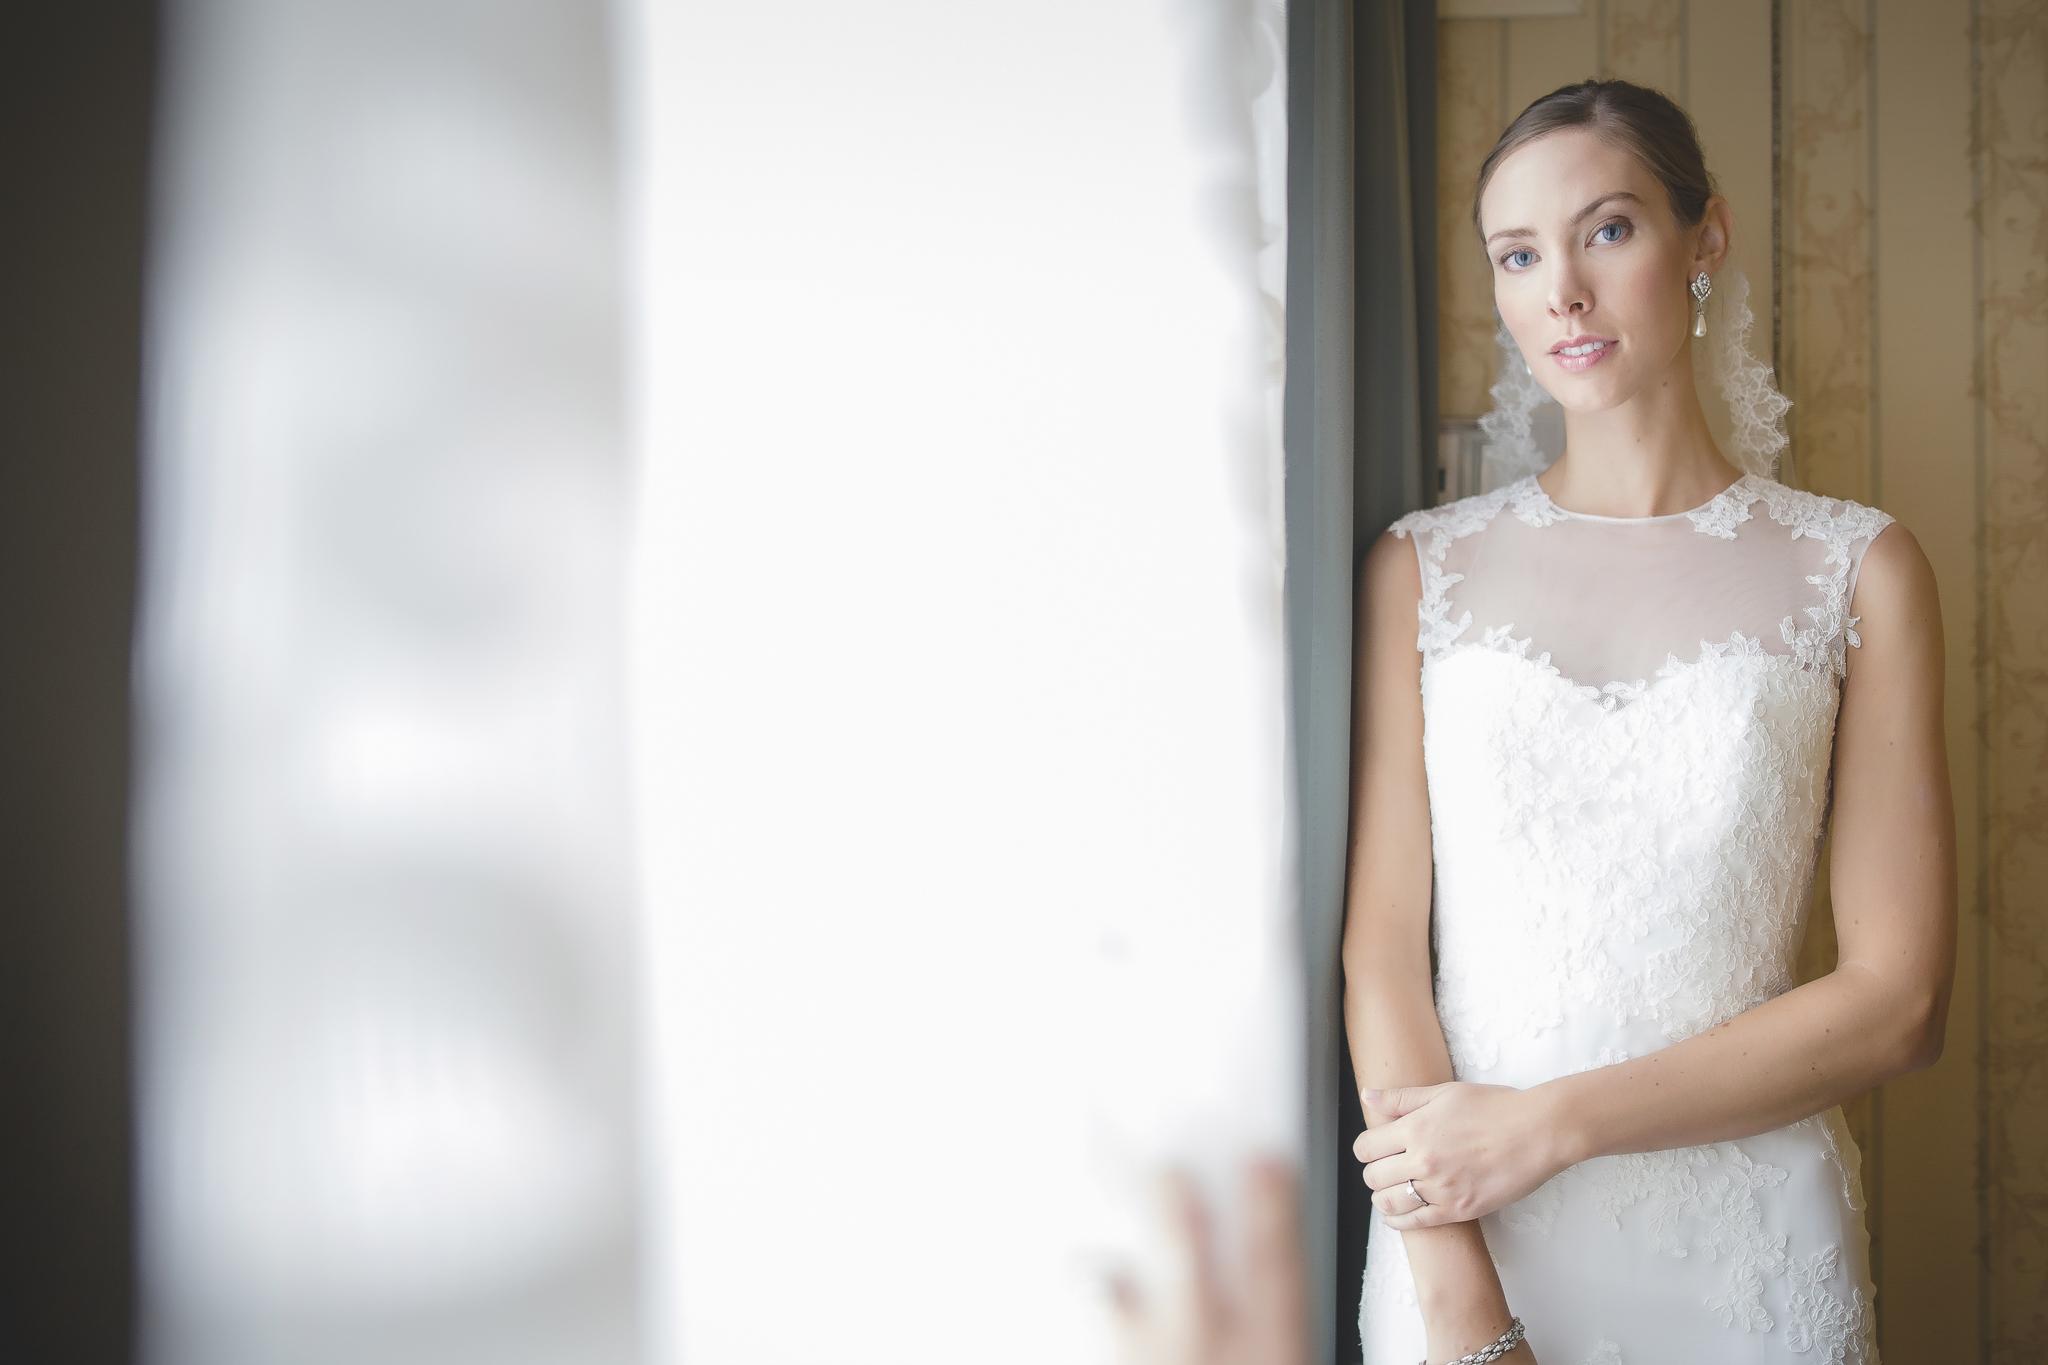 james j hill library wedding photography-6.jpg